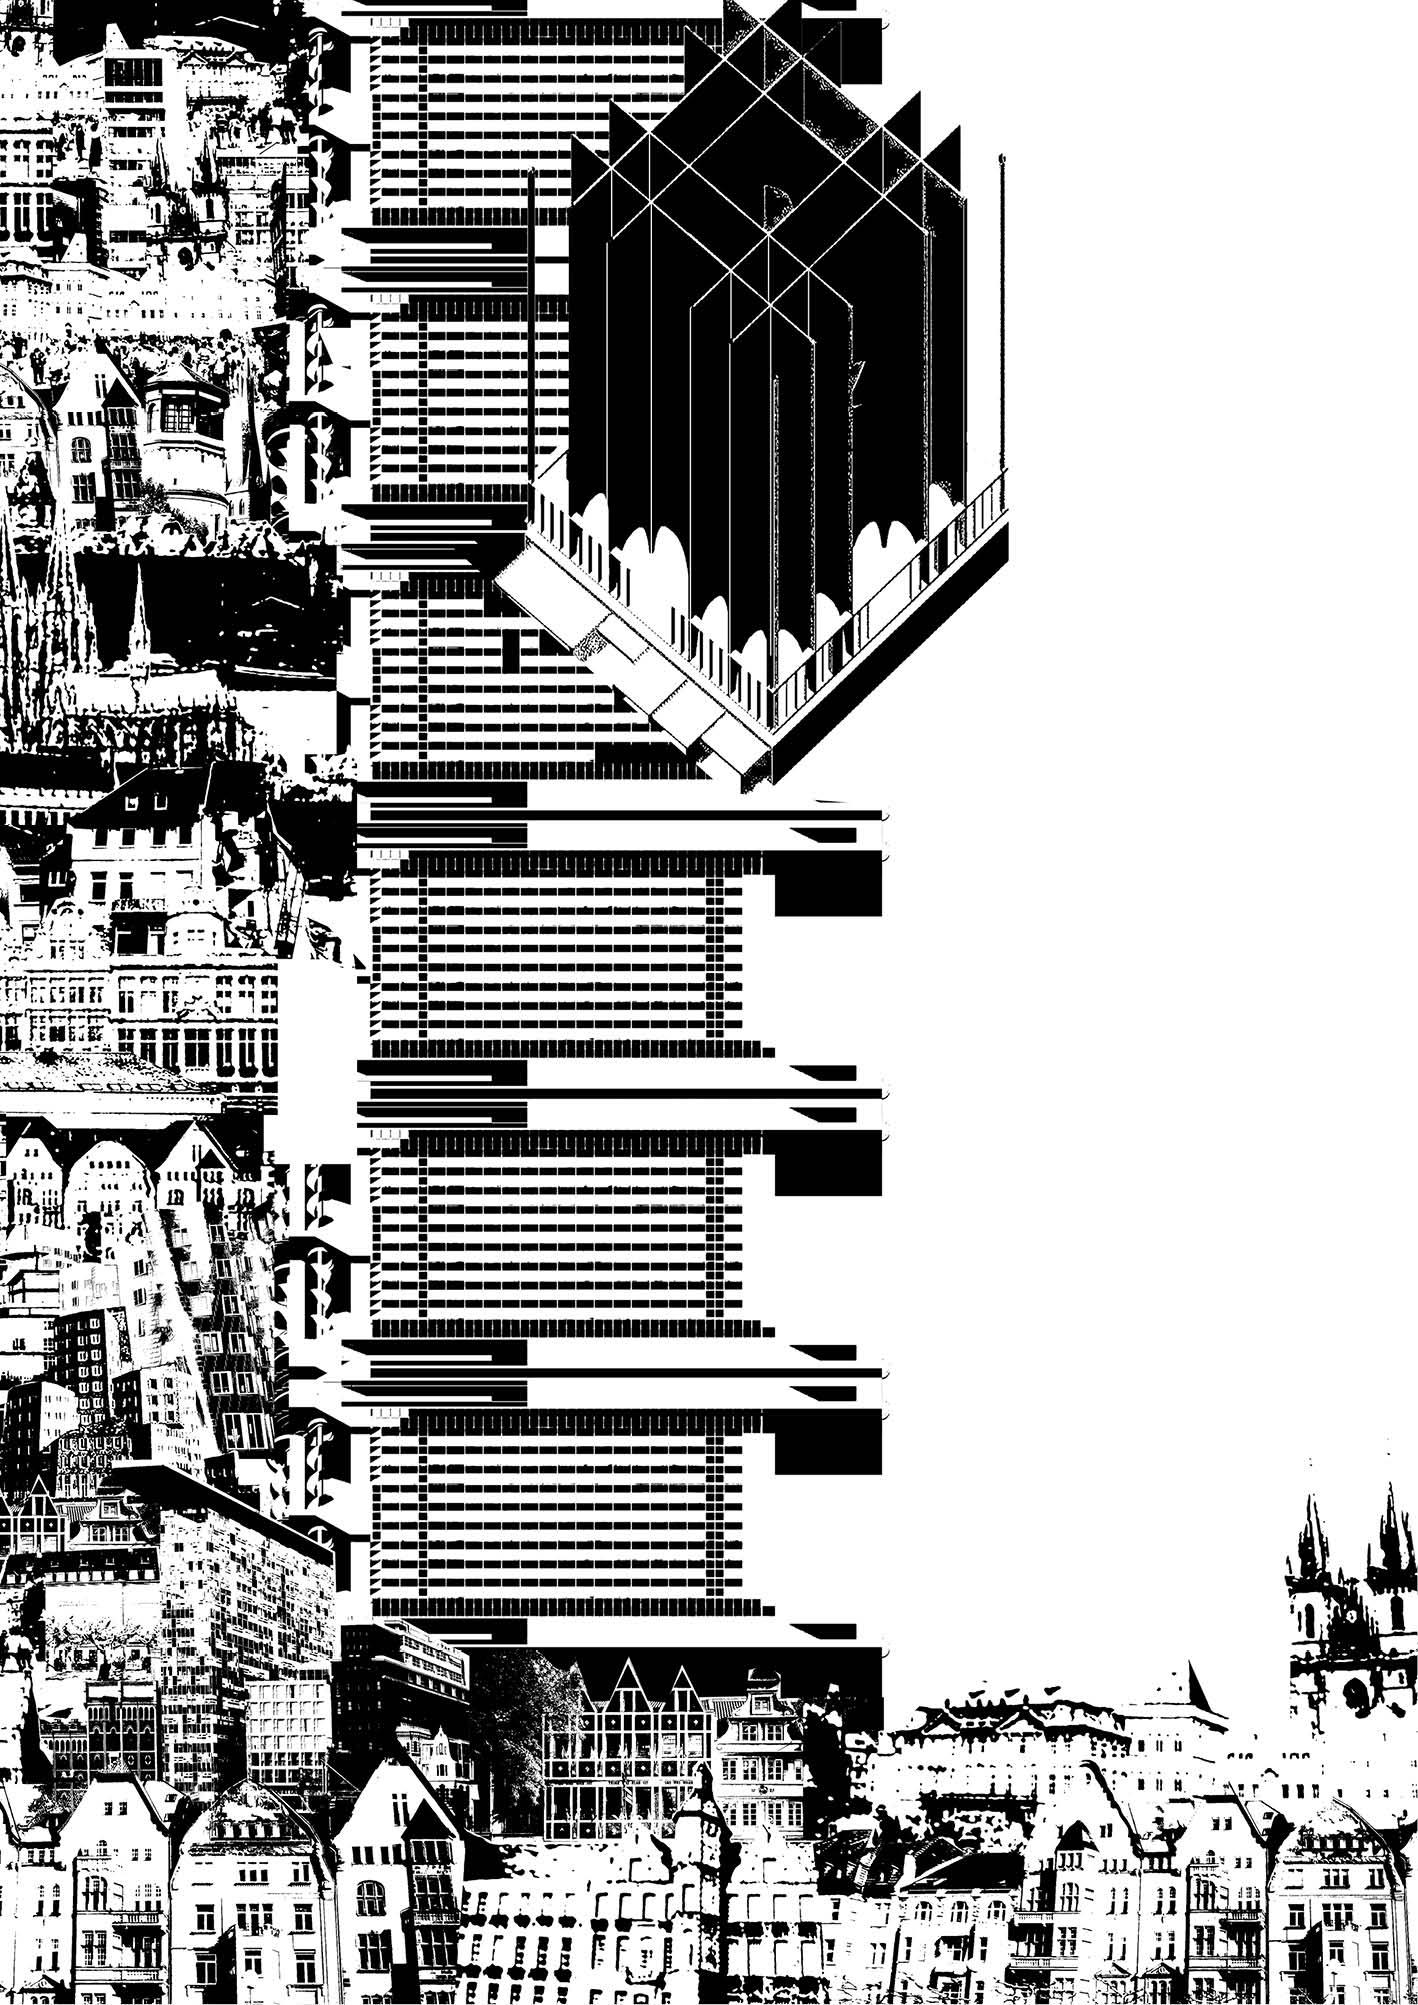 aa school of architecture 2013 - diploma 9 - antoine vaxelaire